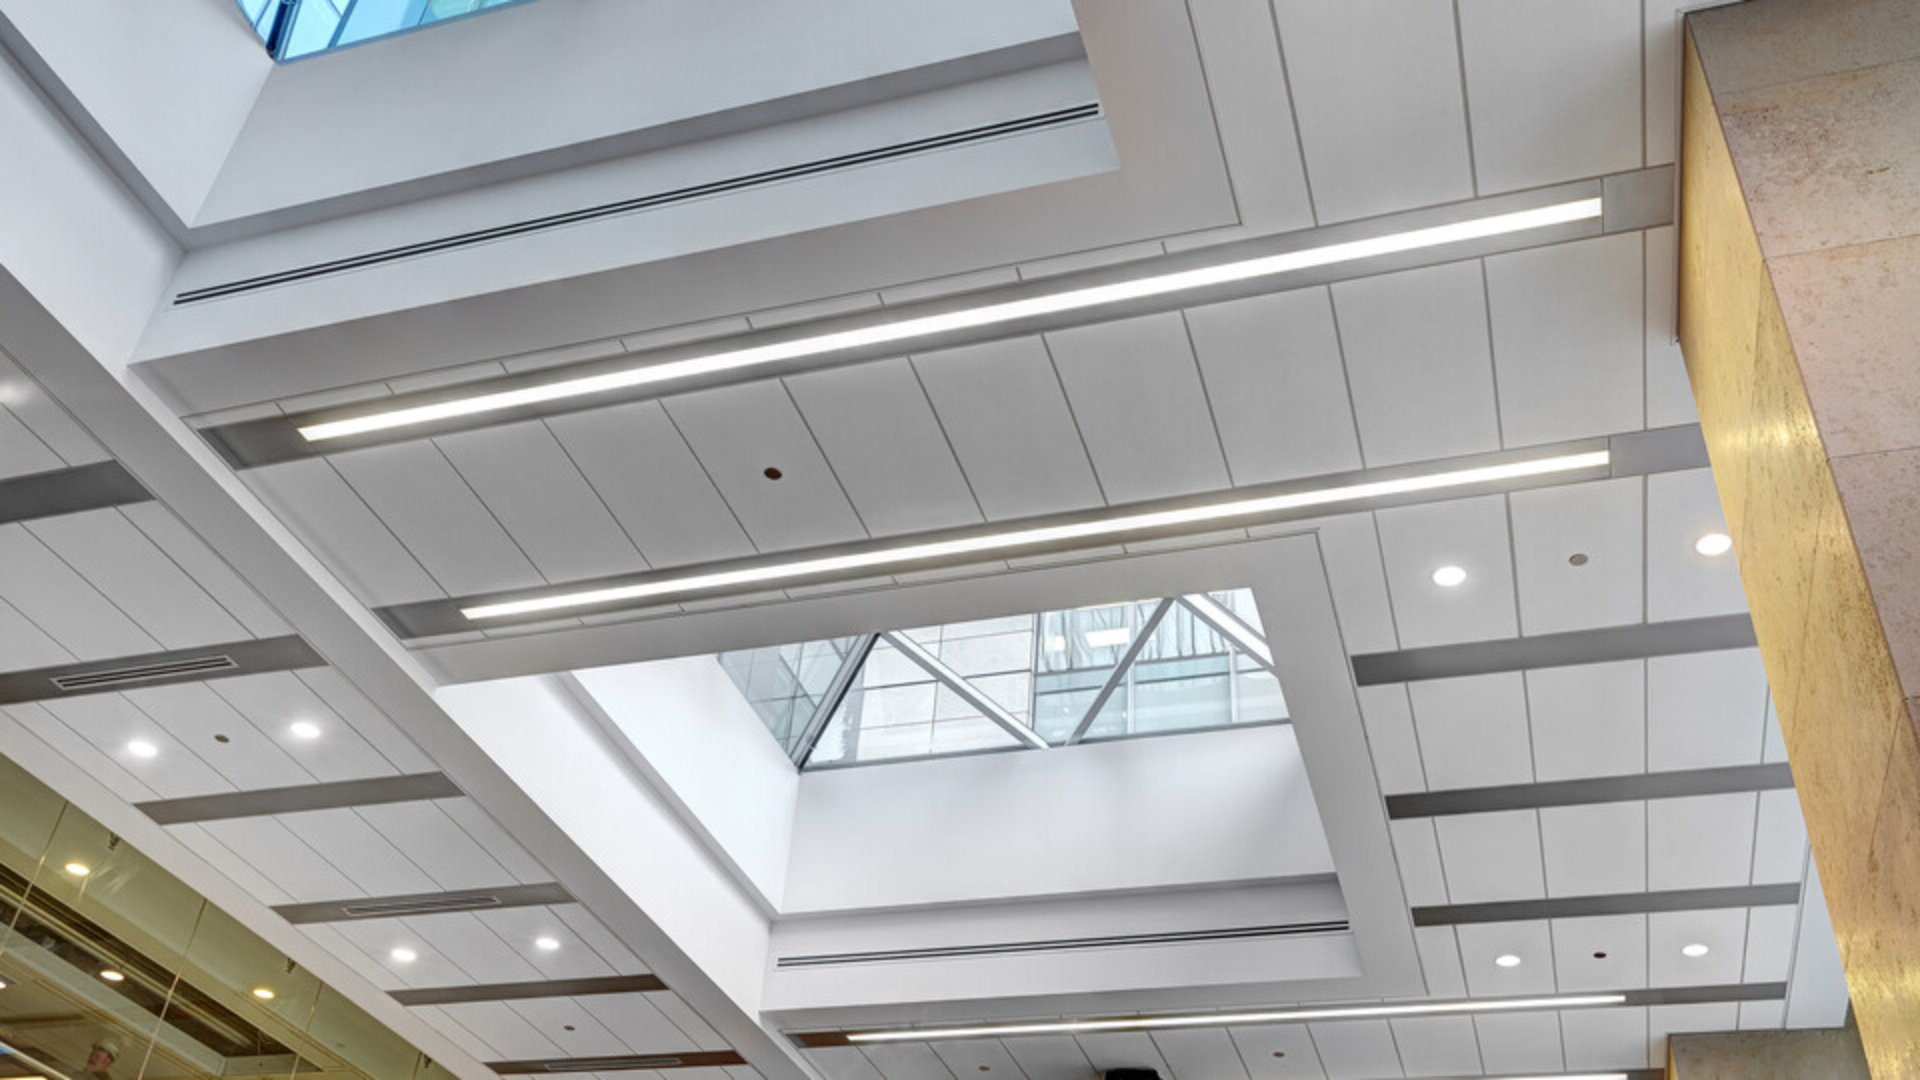 Featured products: Rockfon® Planar® Macro and Planar® Macroplus® Linear Ceilings - Rockfon® Planostile™ Lay-in Metal Panel Ceiling System - Rockfon® Infinity™ Z Perimeter Trim - Rockfon® Spanair® Plank Hook-on Metal Panel Ceiling System